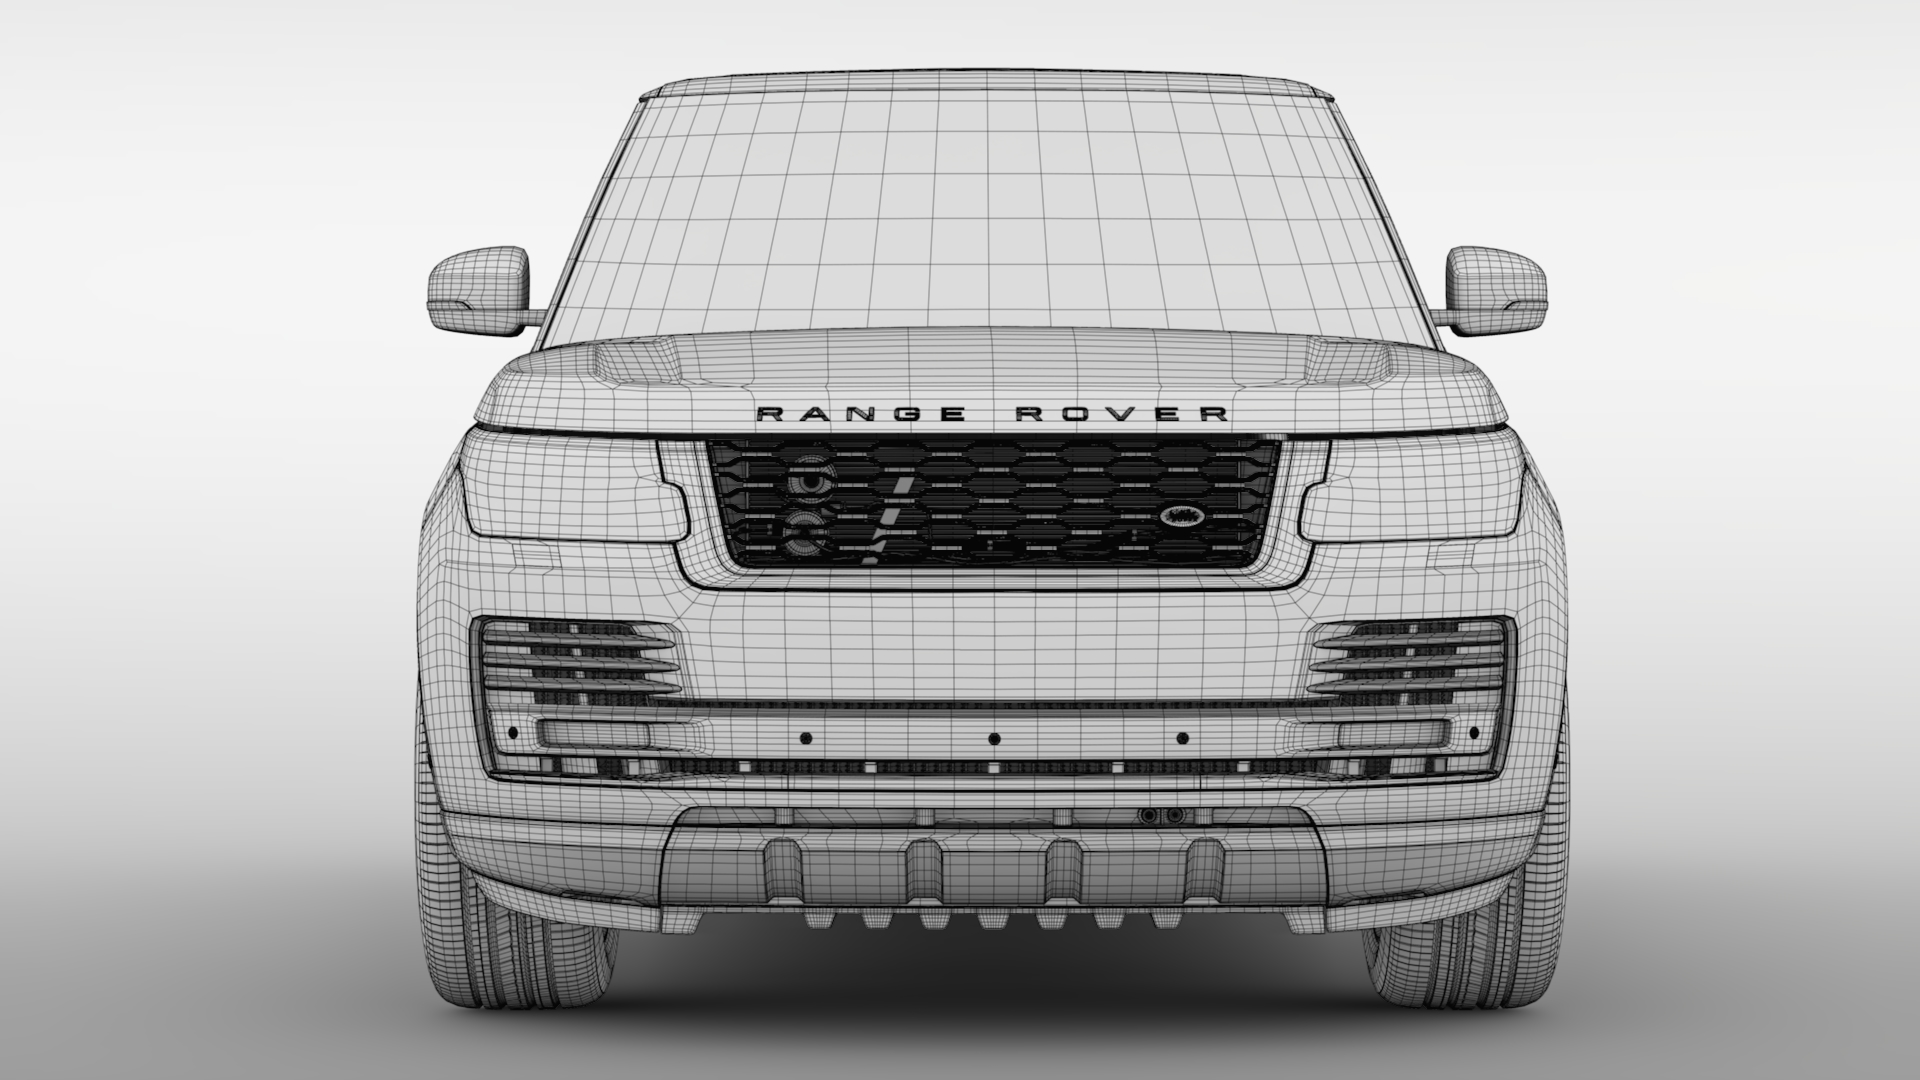 range rover autobiography hybrid (l405) 2018 3d model max fbx c4d lwo ma mb hrc xsi obj 278158